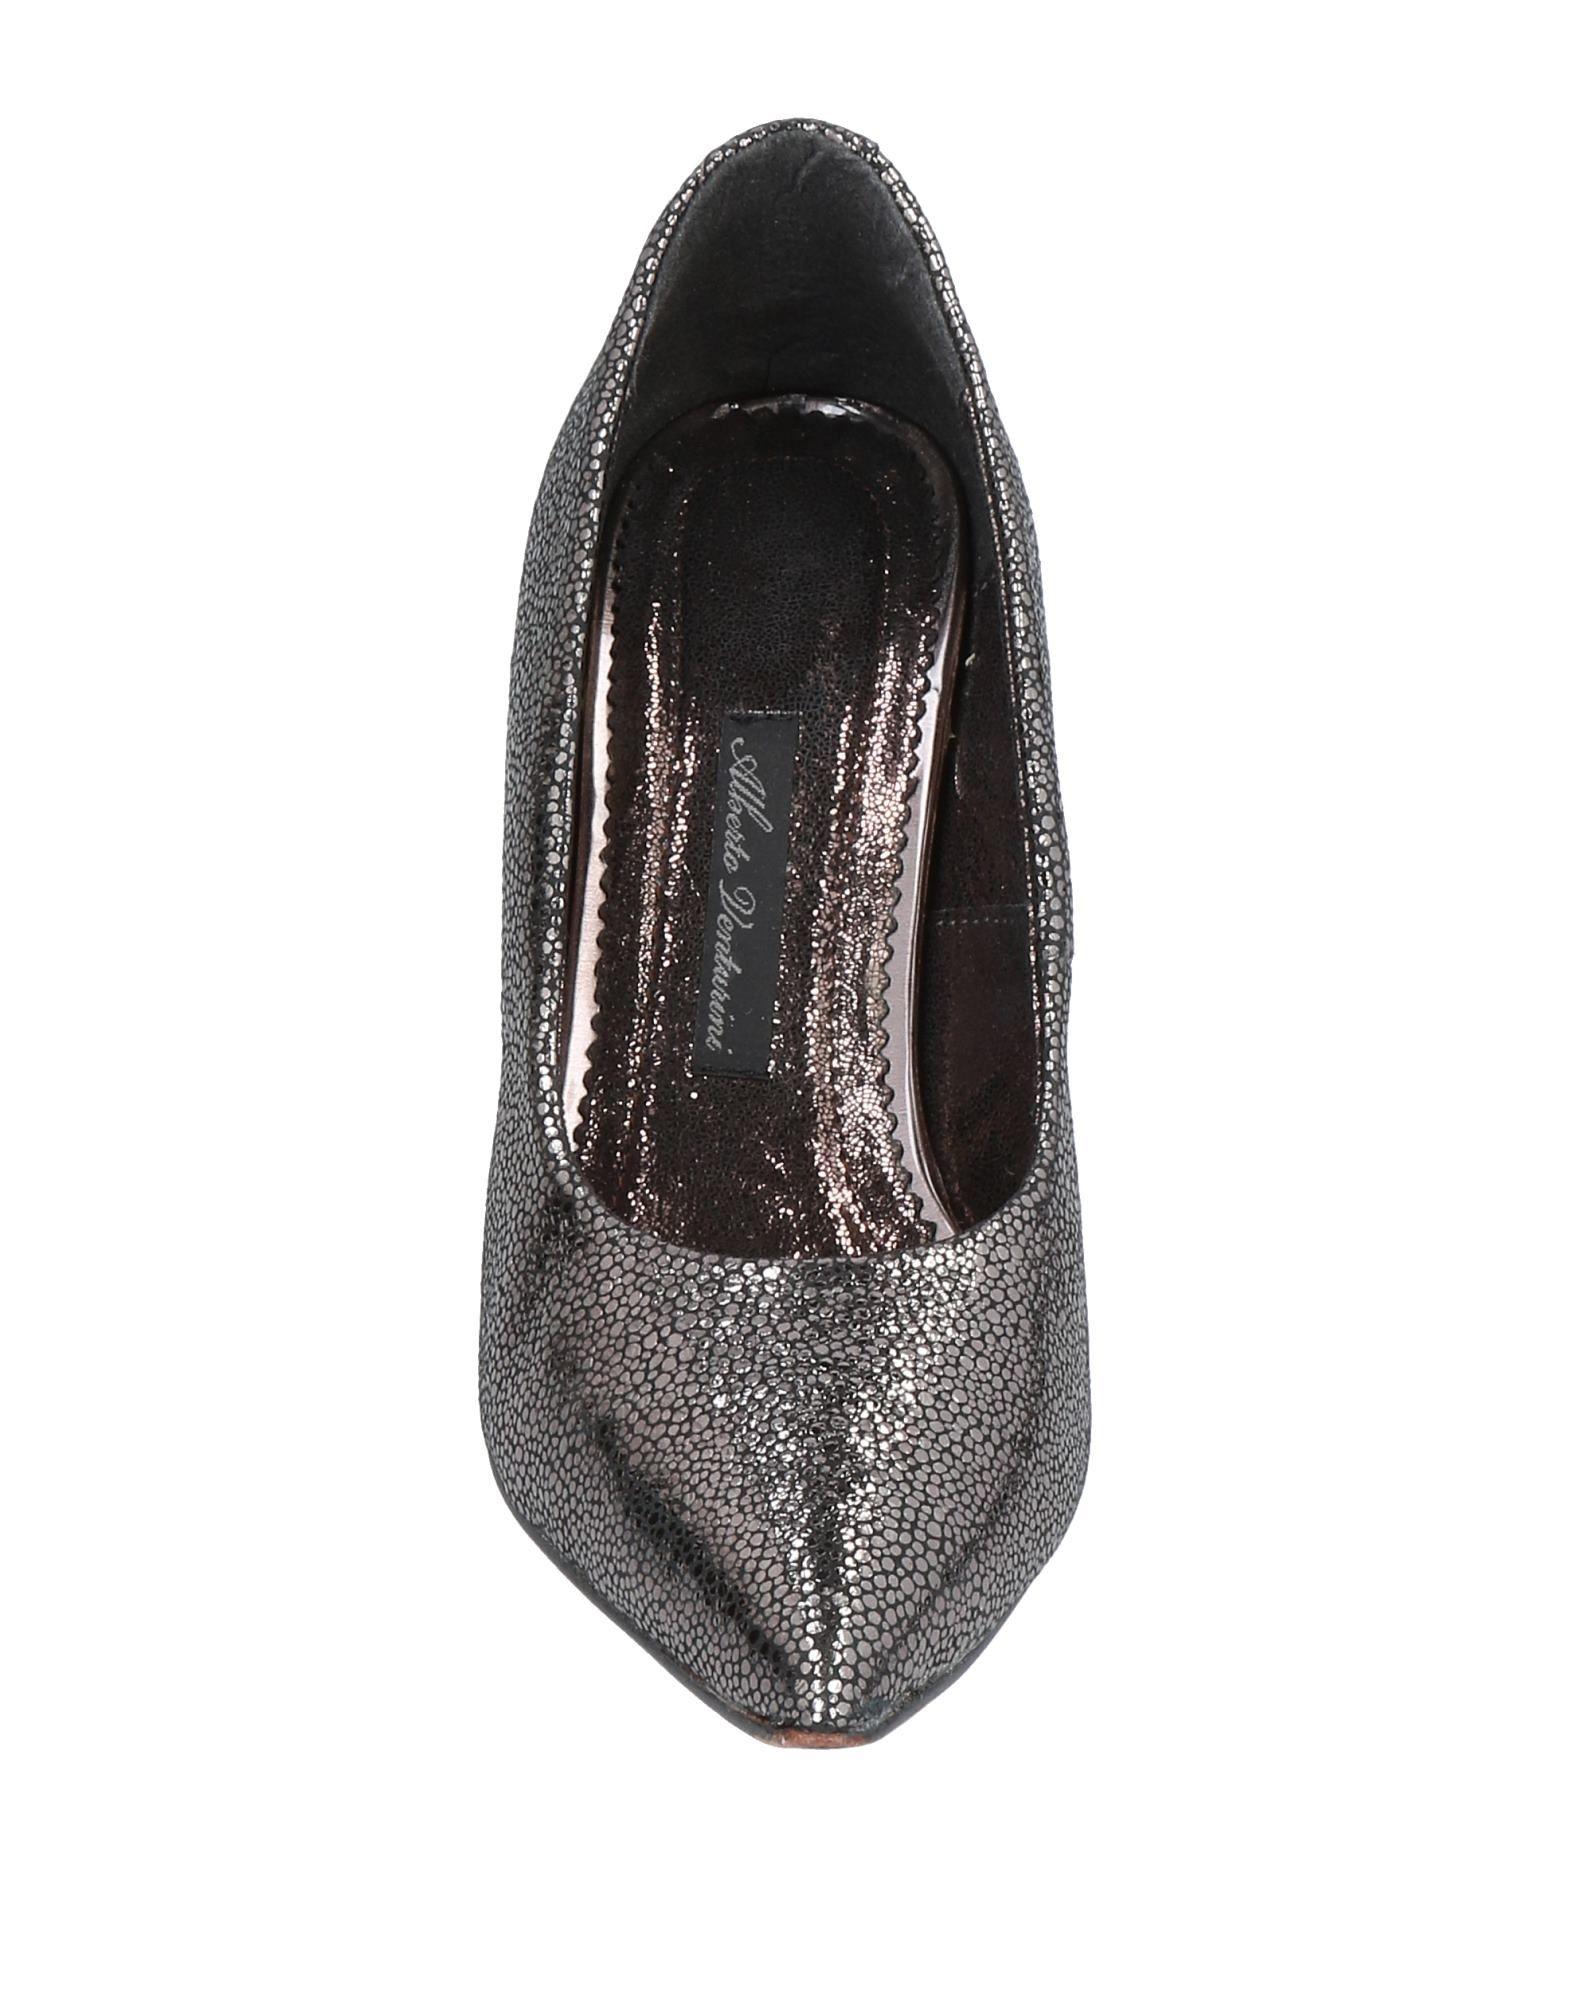 Stilvolle Venturini billige Schuhe Alberto Venturini Stilvolle Pumps Damen  11485918OH 26b154